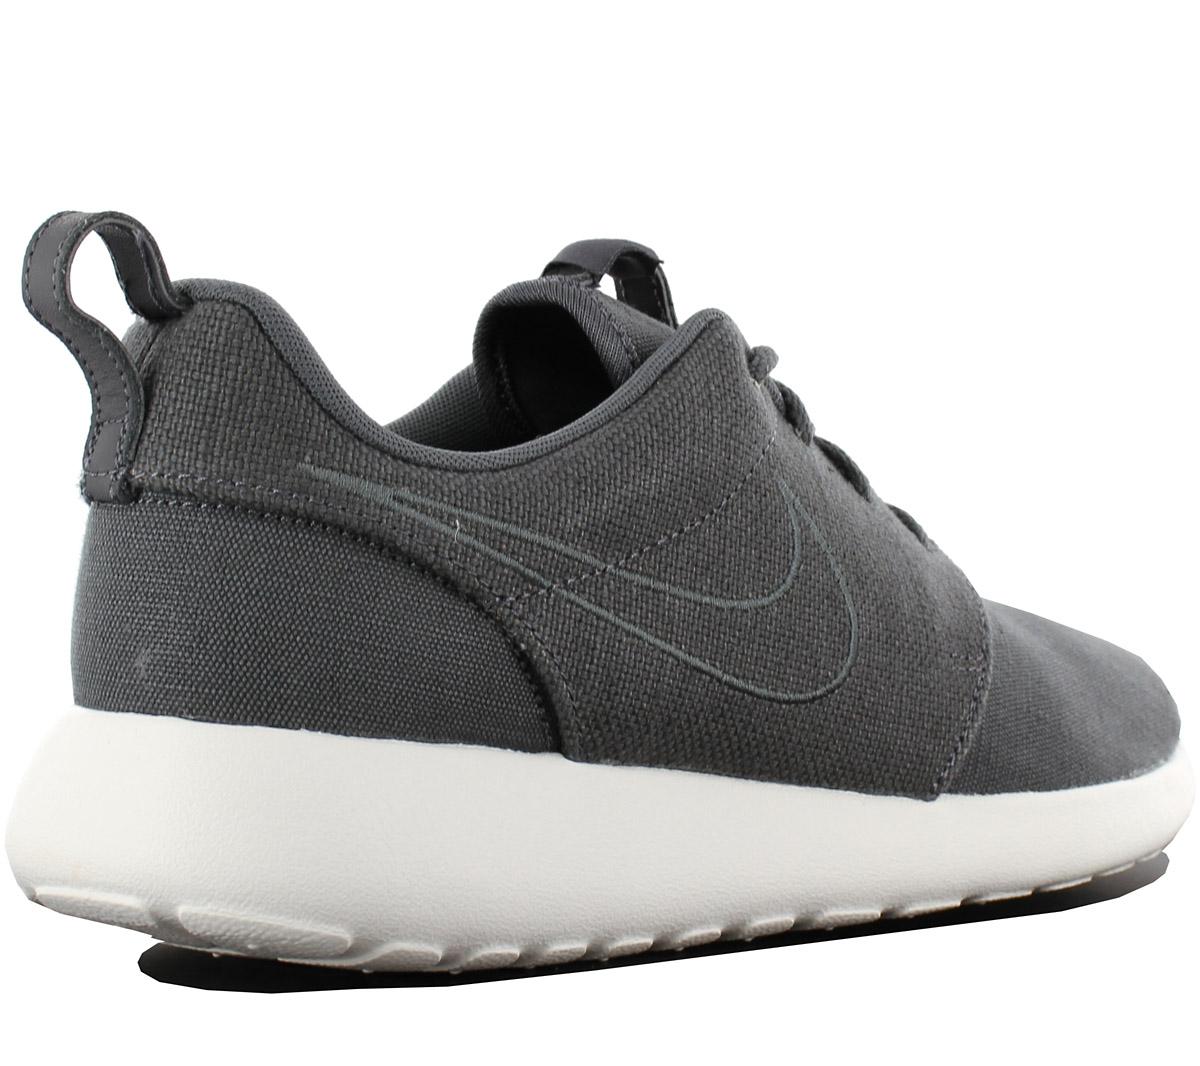 e96837dcbf077 Nike Roshe One Premium Men s Sneakers Shoes Textile Grey Run Two ...